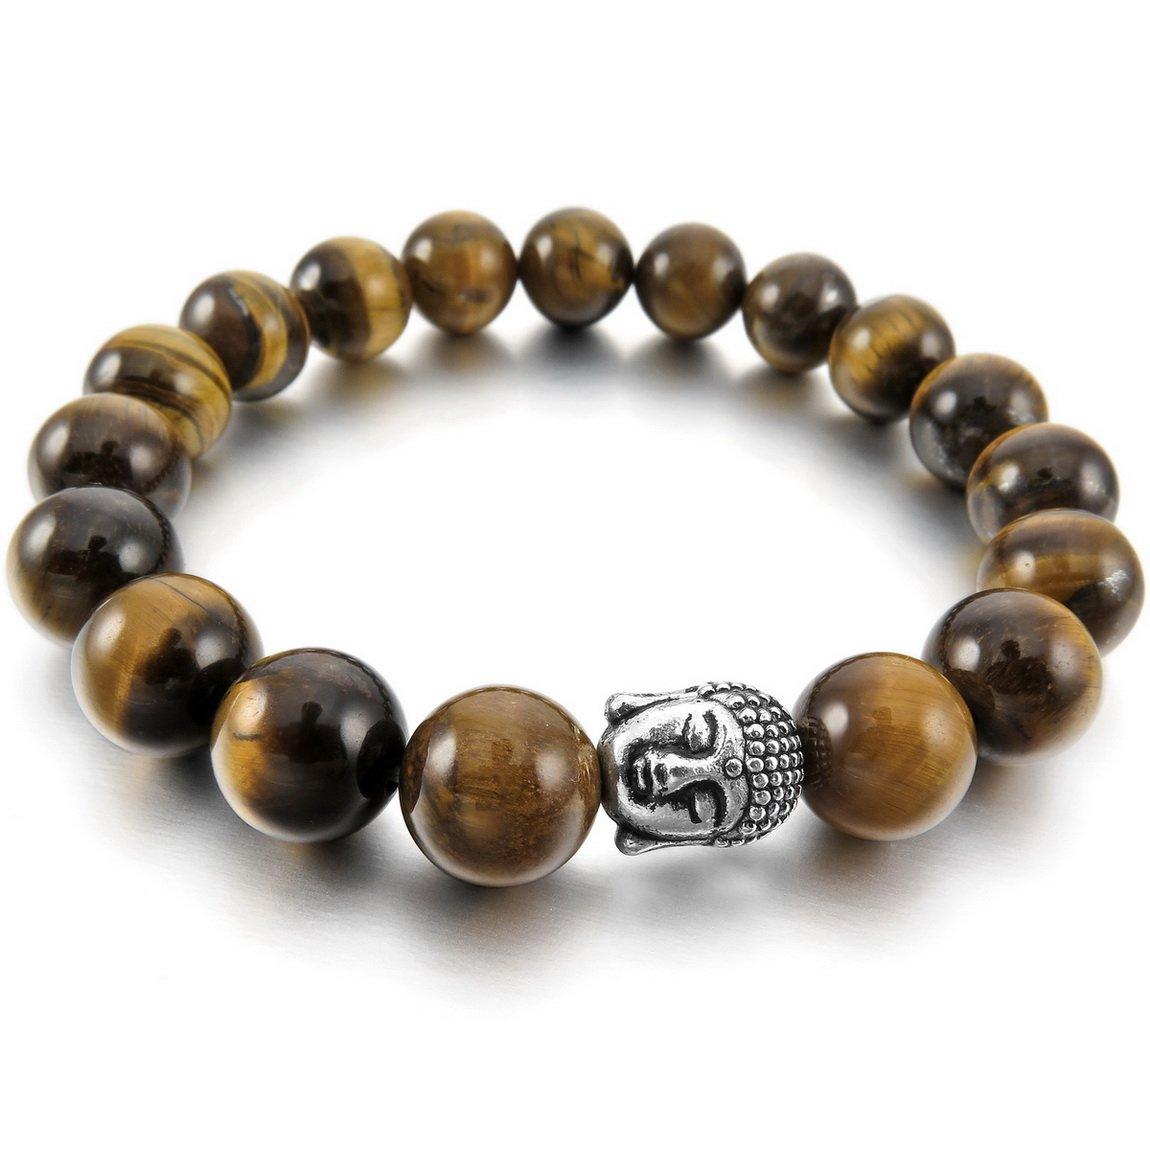 INBLUE Women,Men's 10mm Alloy Energy Bracelet Link Wrist Energy Stone Brown Silver Tone Buddha Mala Bead